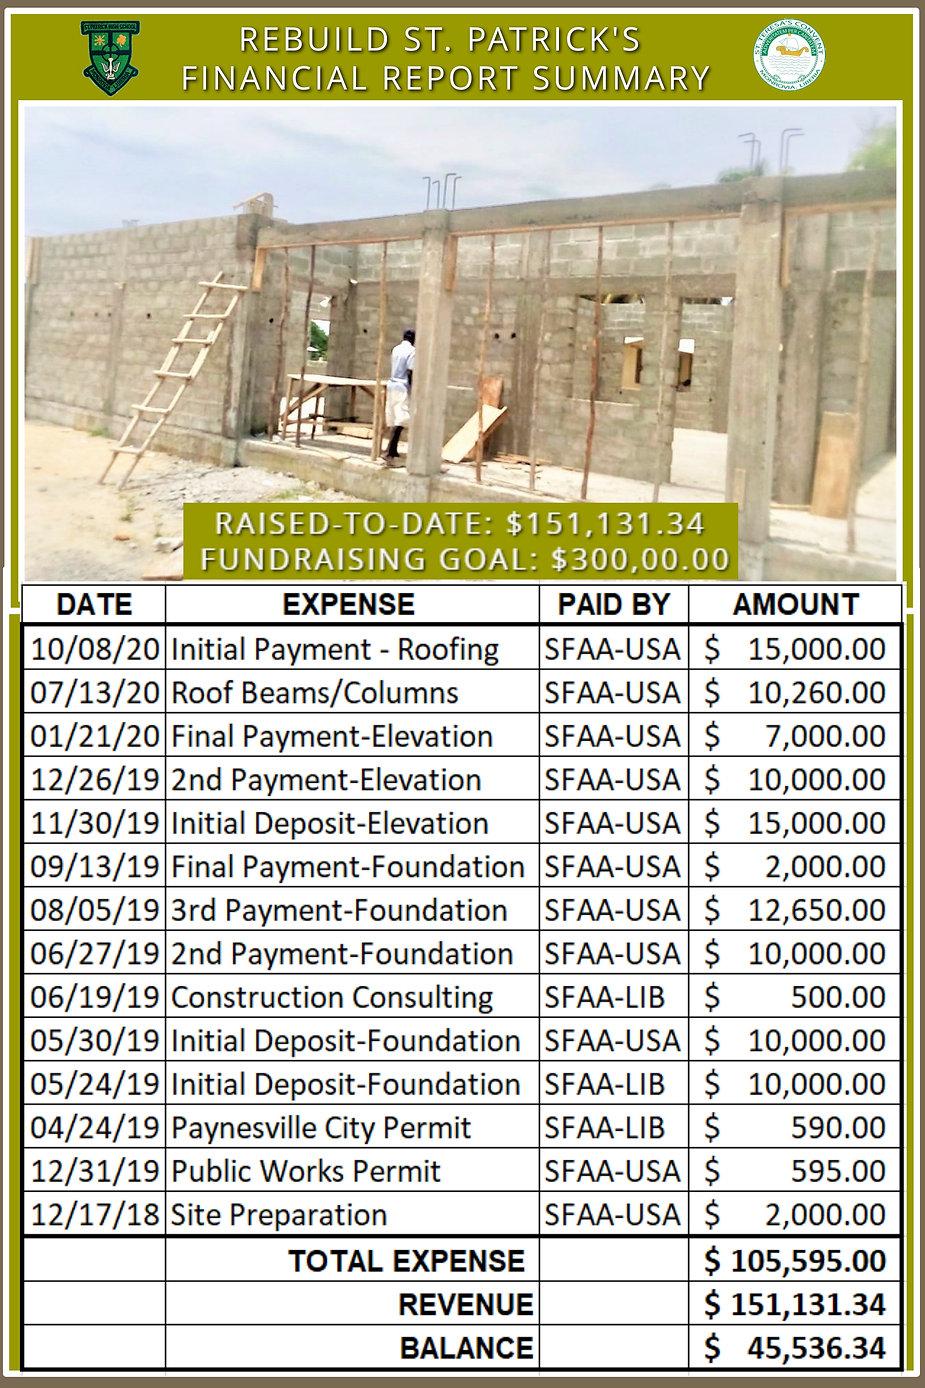 Financial Report Summary - Rebuild St. P